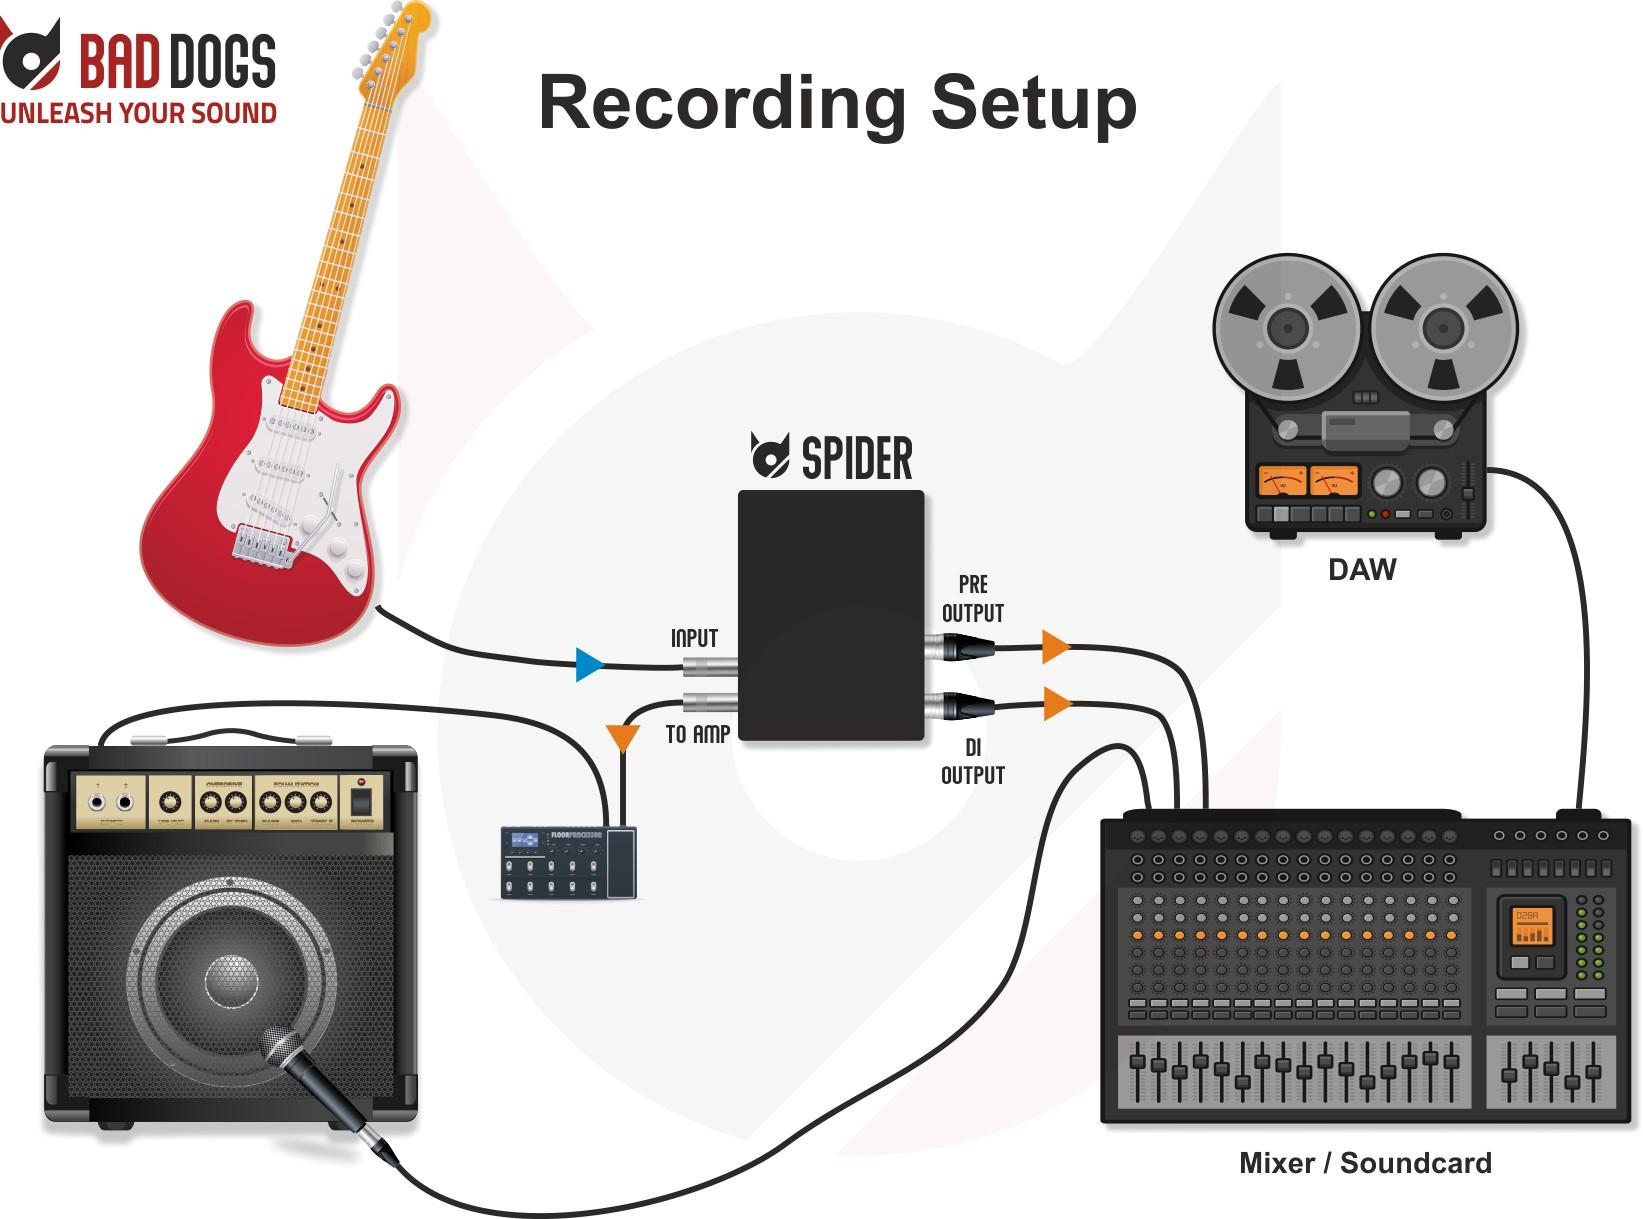 Spider Use Case Recording Setup